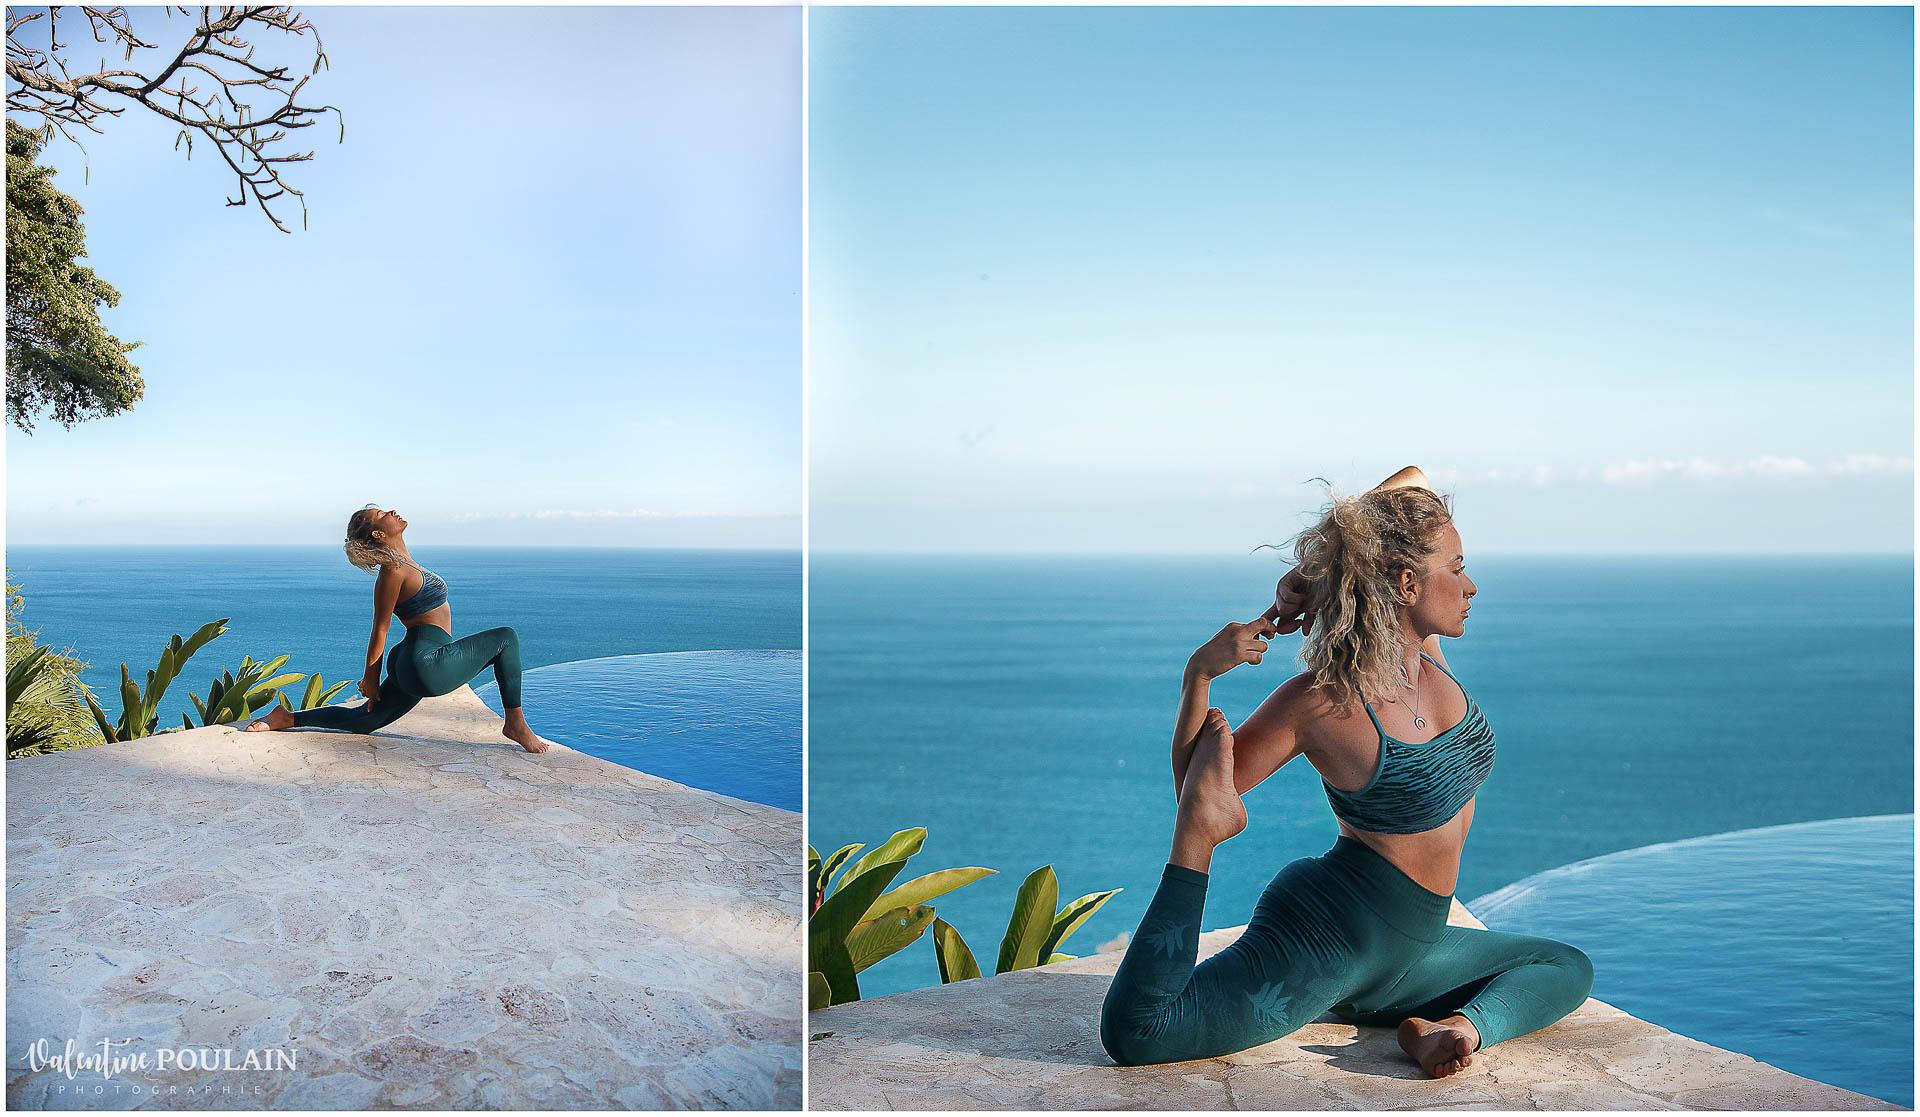 Photo Hotel Costa Rica ANAMAYA_ Valentine Poulain yoga girl